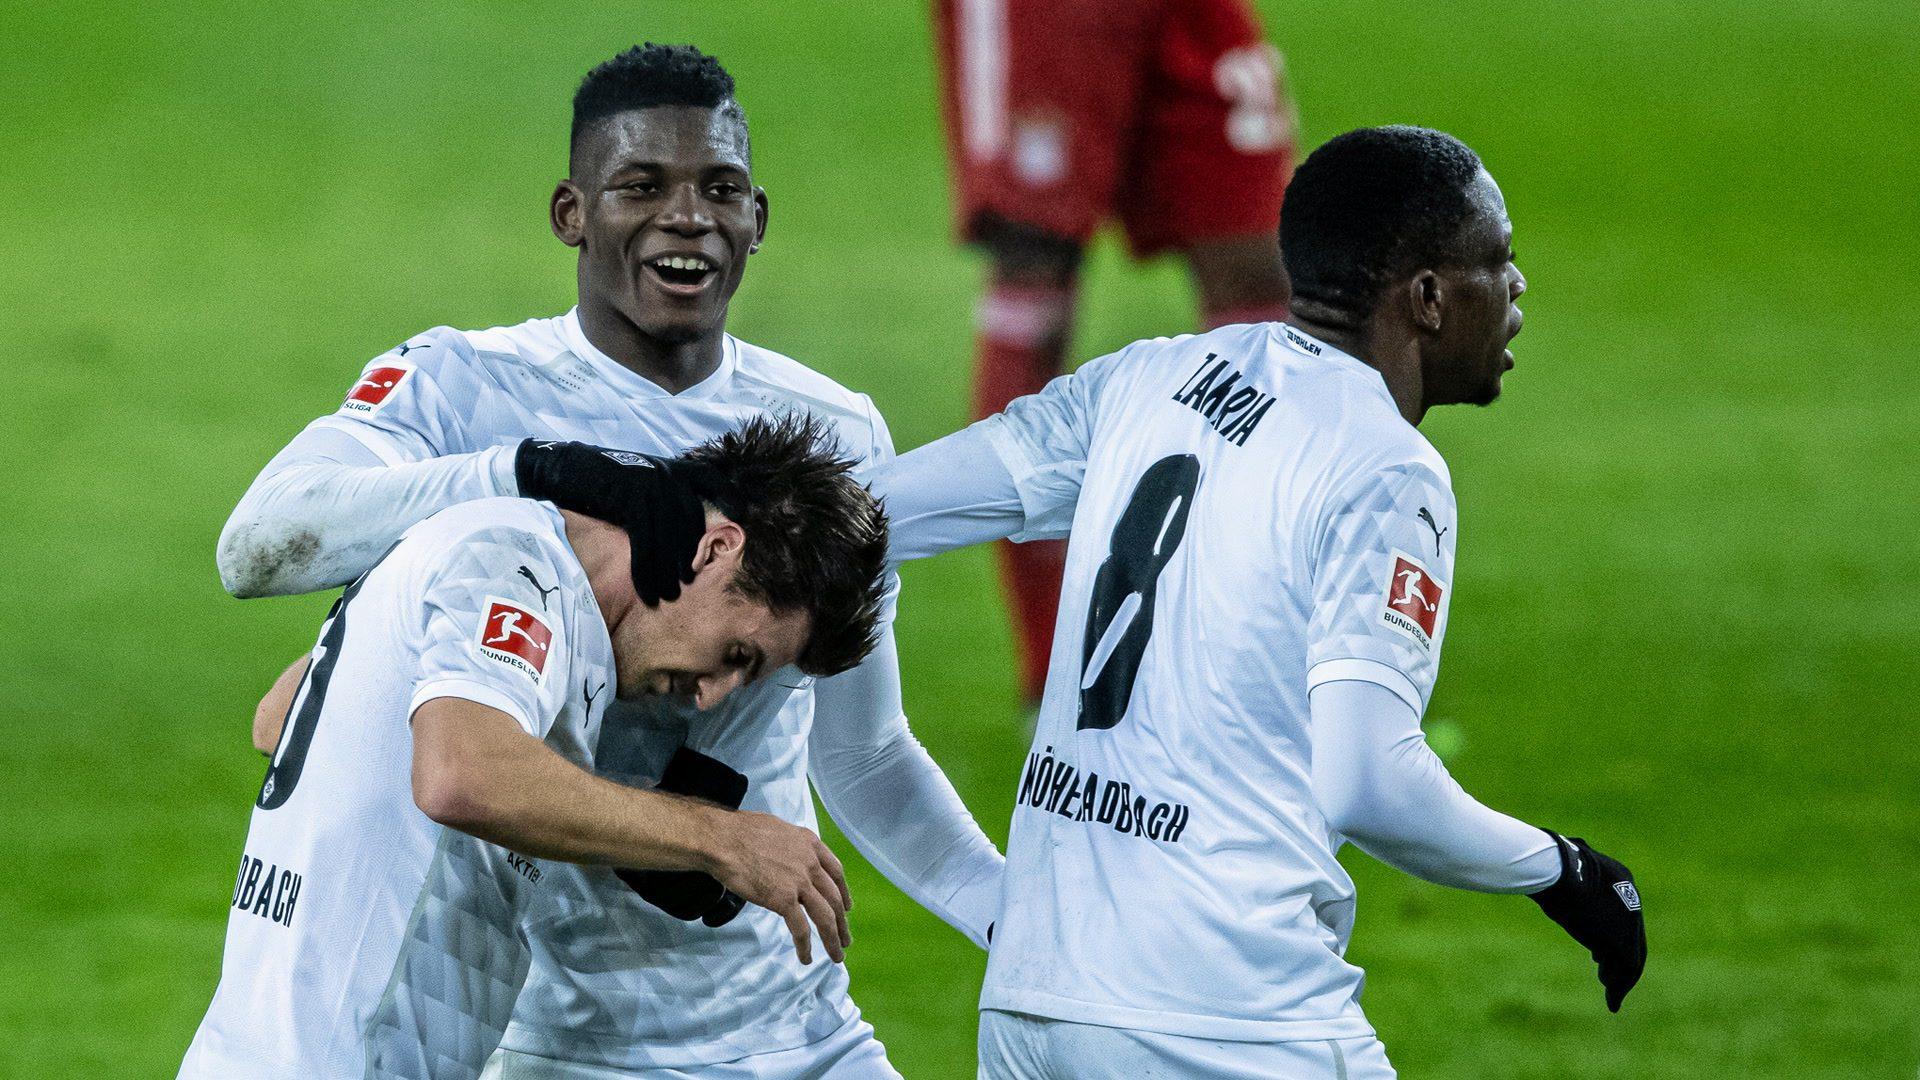 Stunning Gladbach comeback seals dramatic win over Bayern